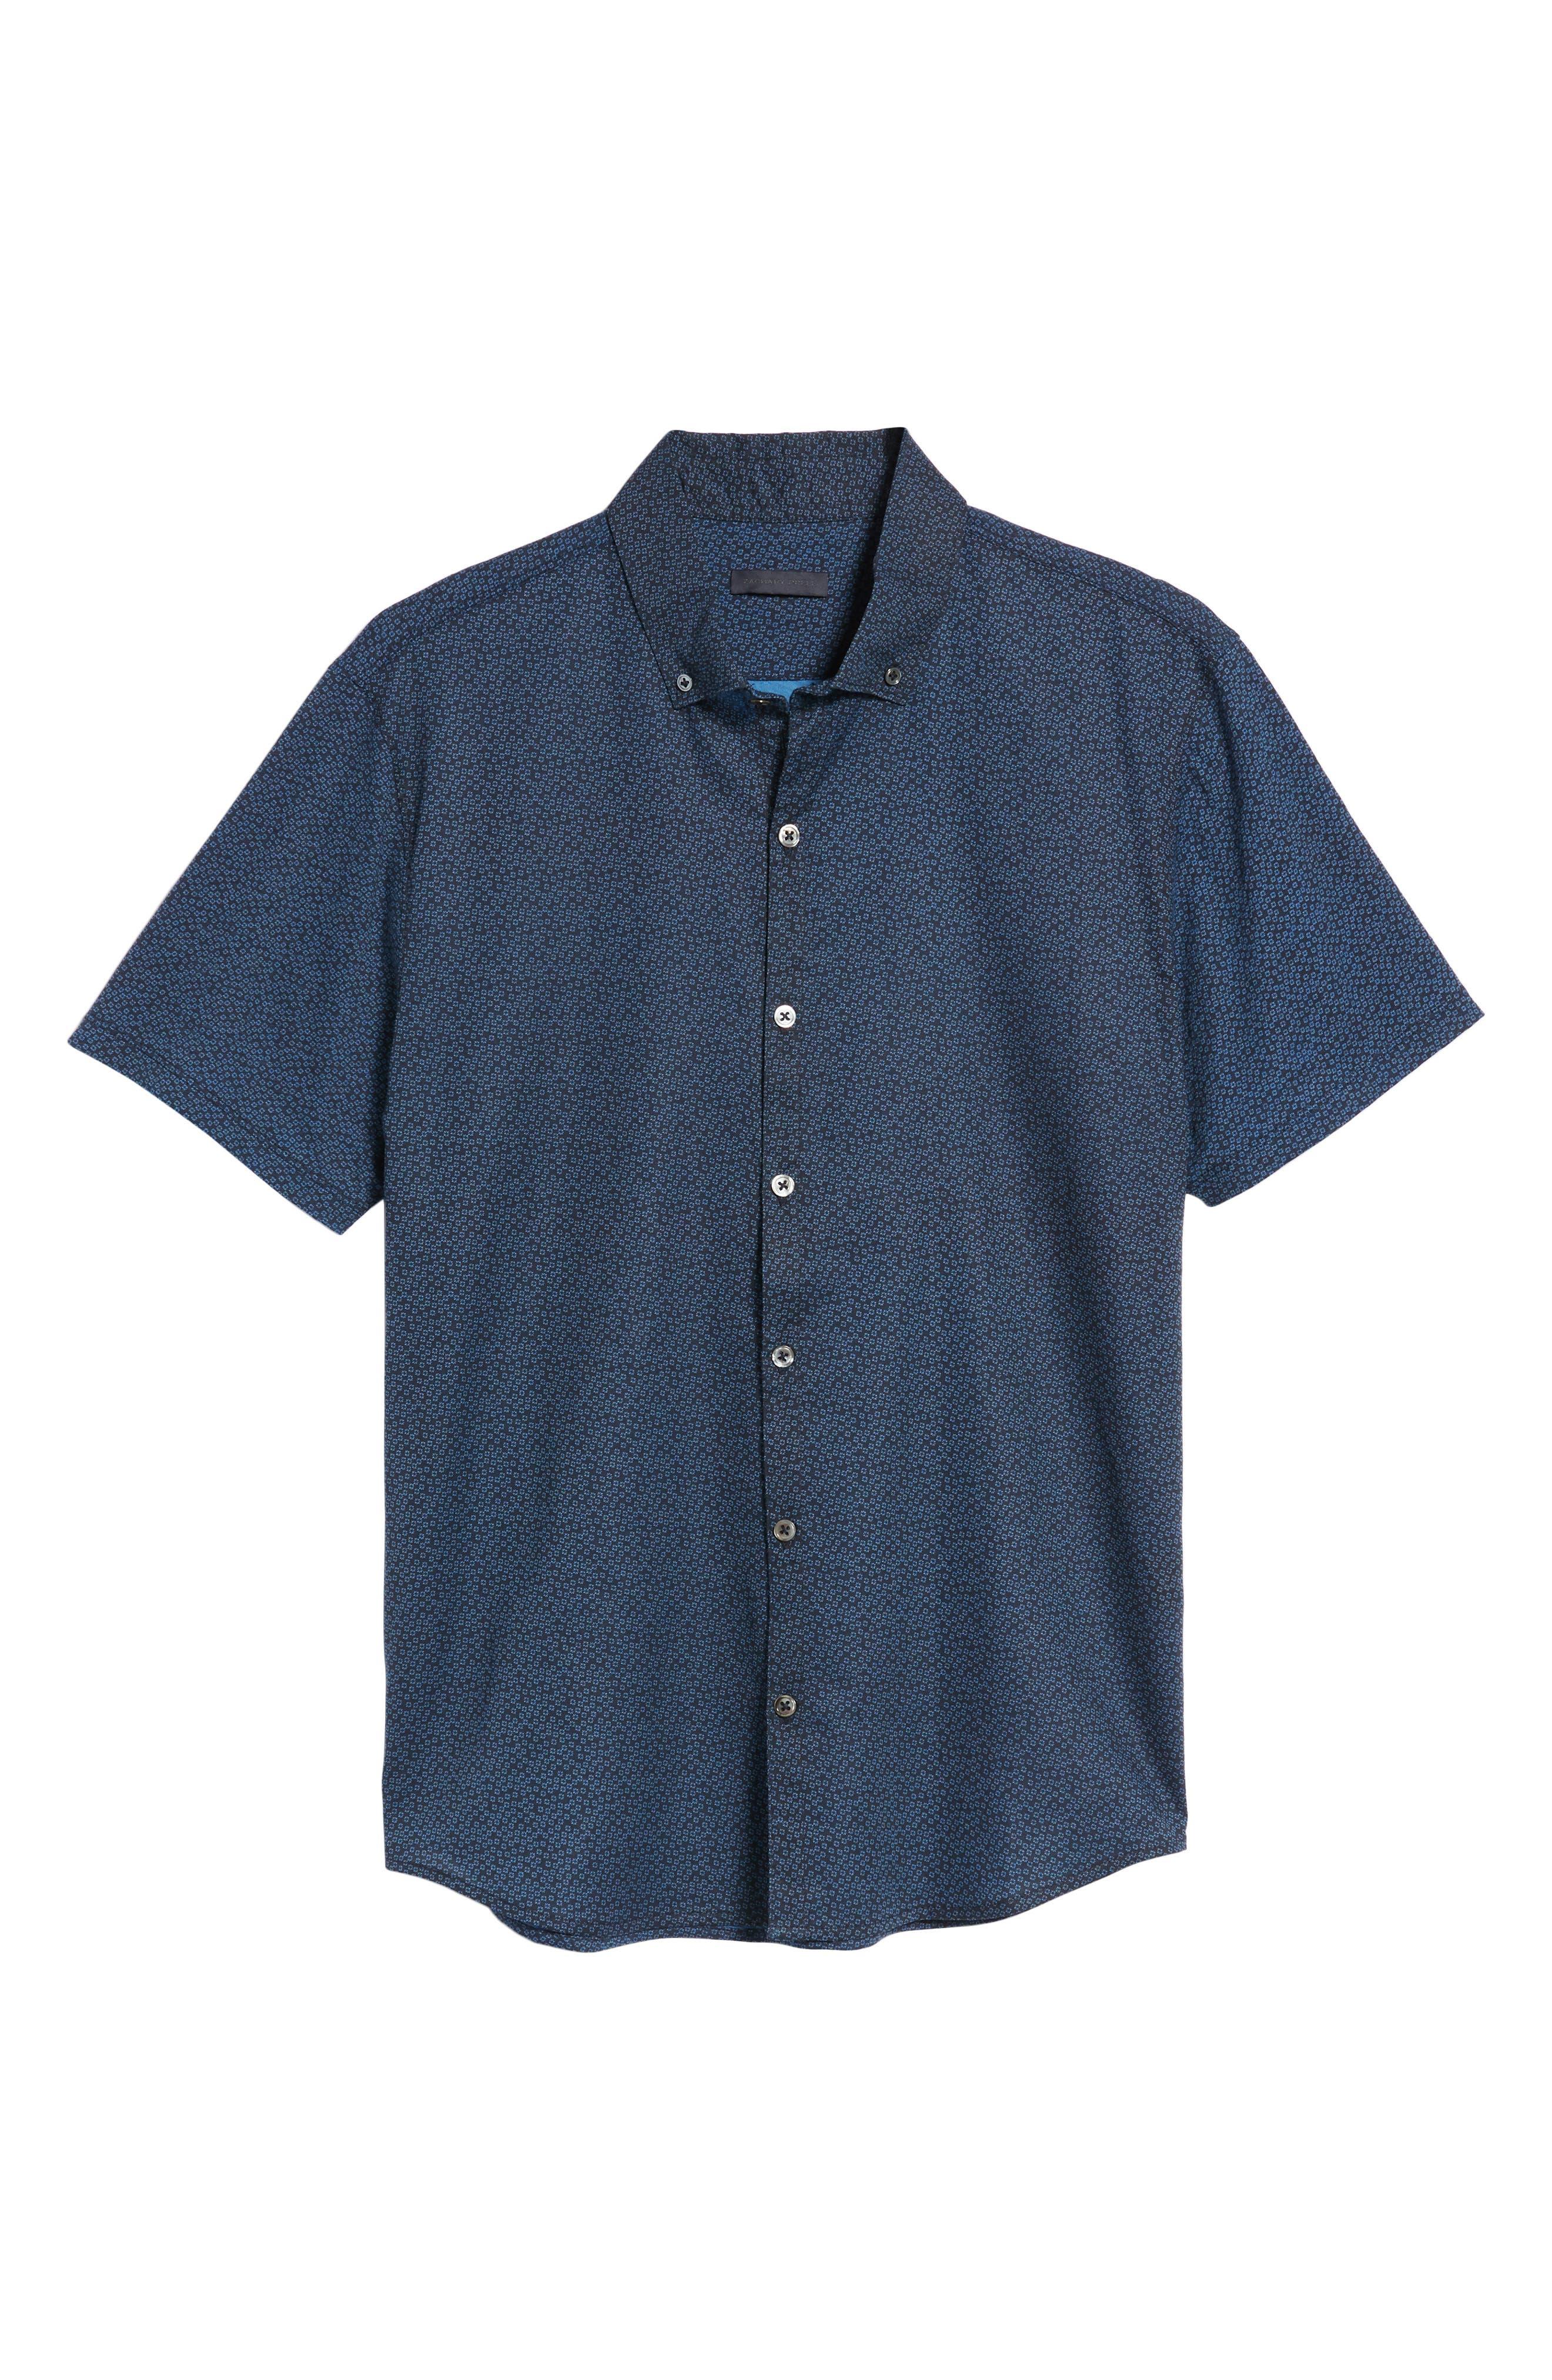 Clyde Slim Fit Sport Shirt,                             Alternate thumbnail 6, color,                             410